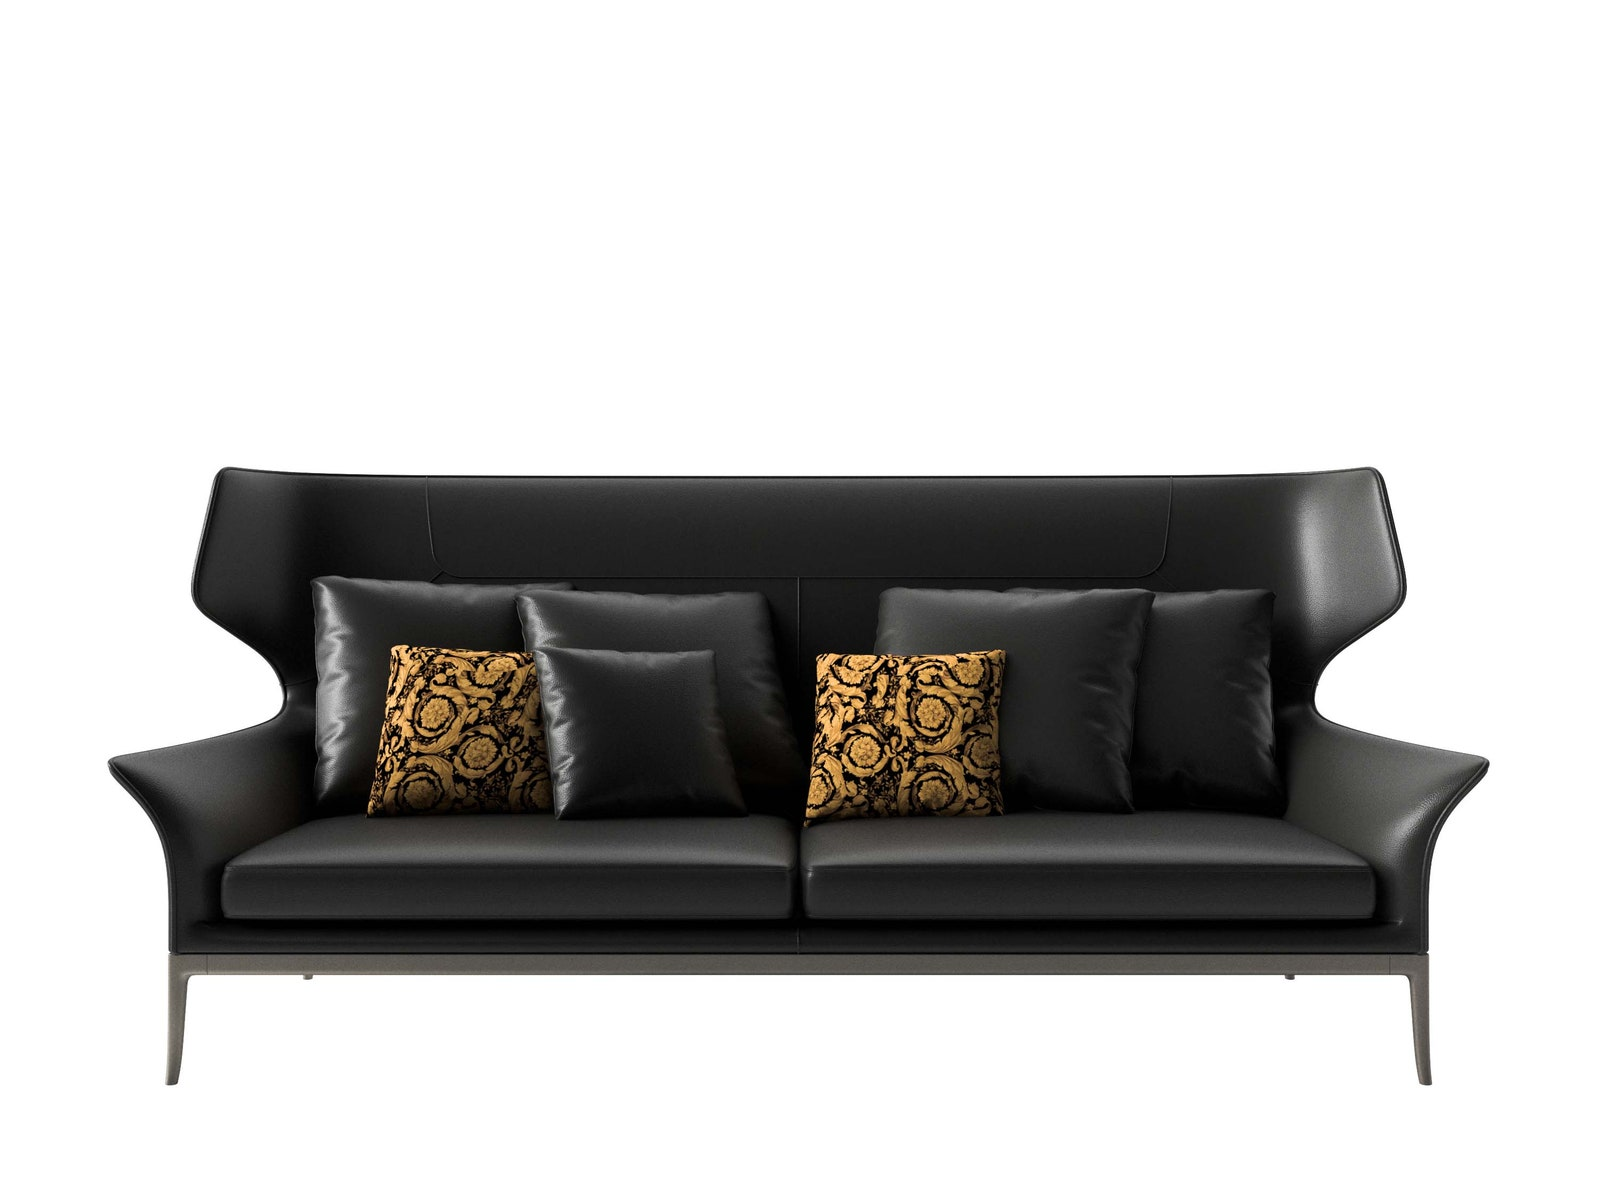 Versace. Stiletto Seater Sofa.